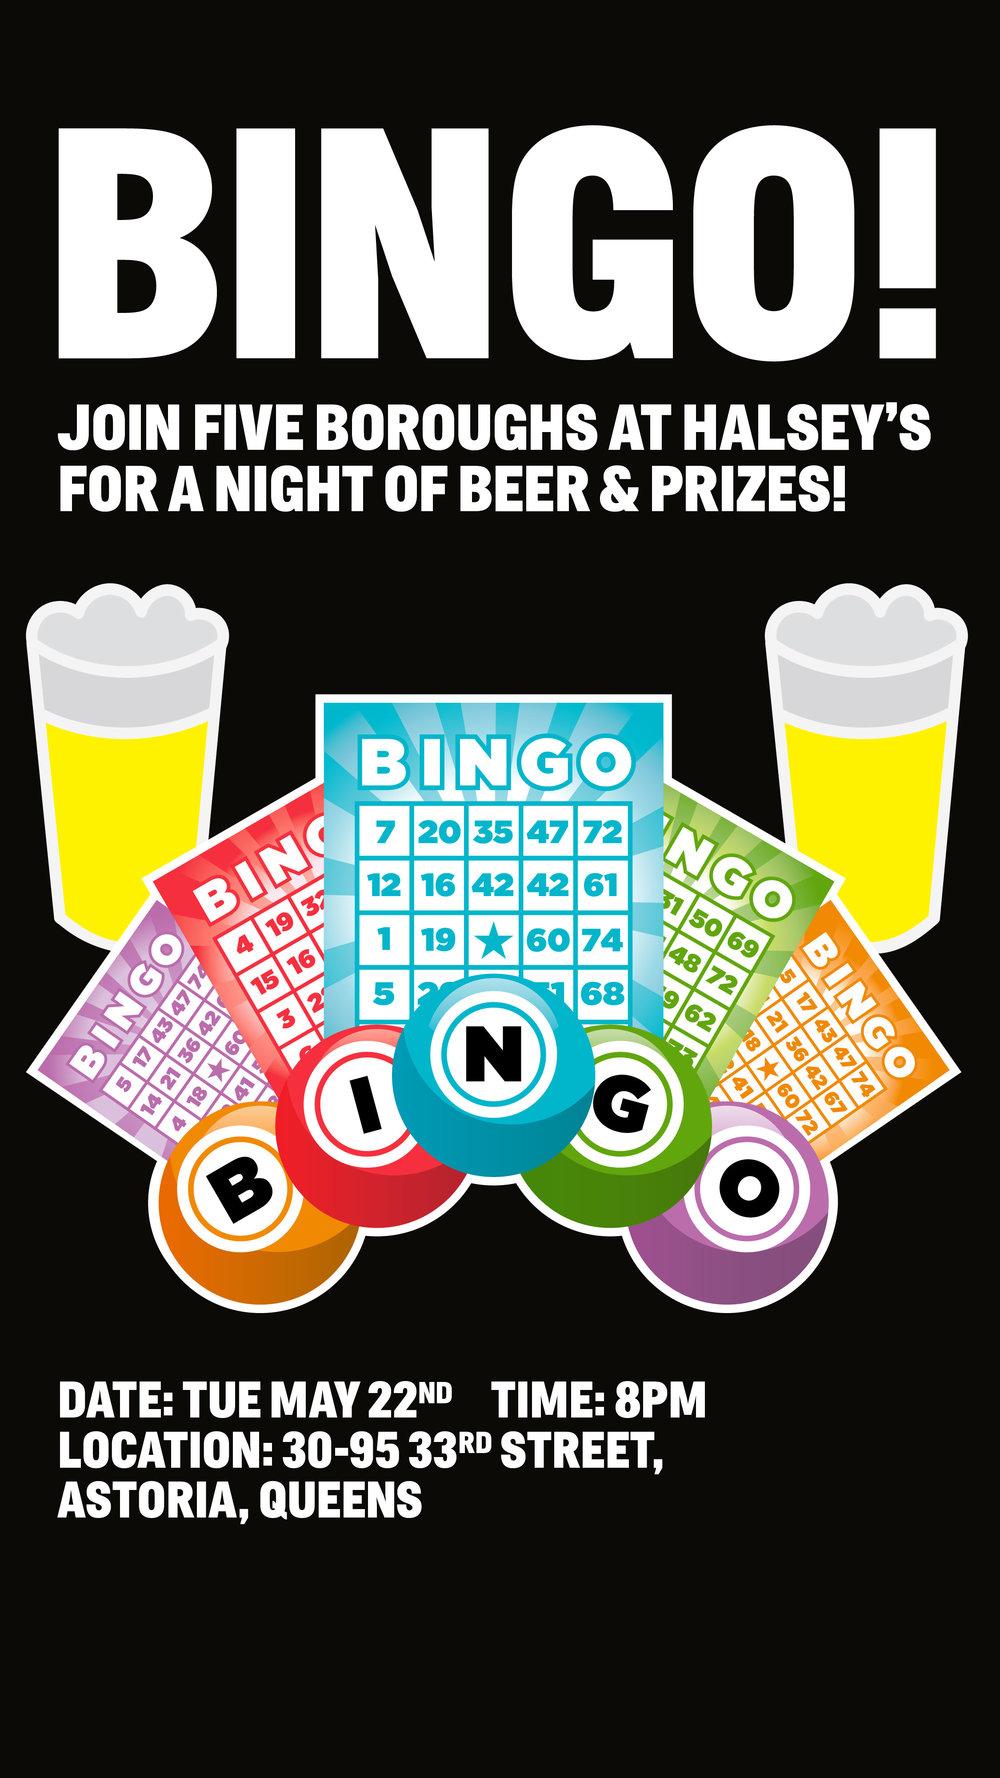 IG Story - Halseys Bingo and Five Boroughs-01.jpg